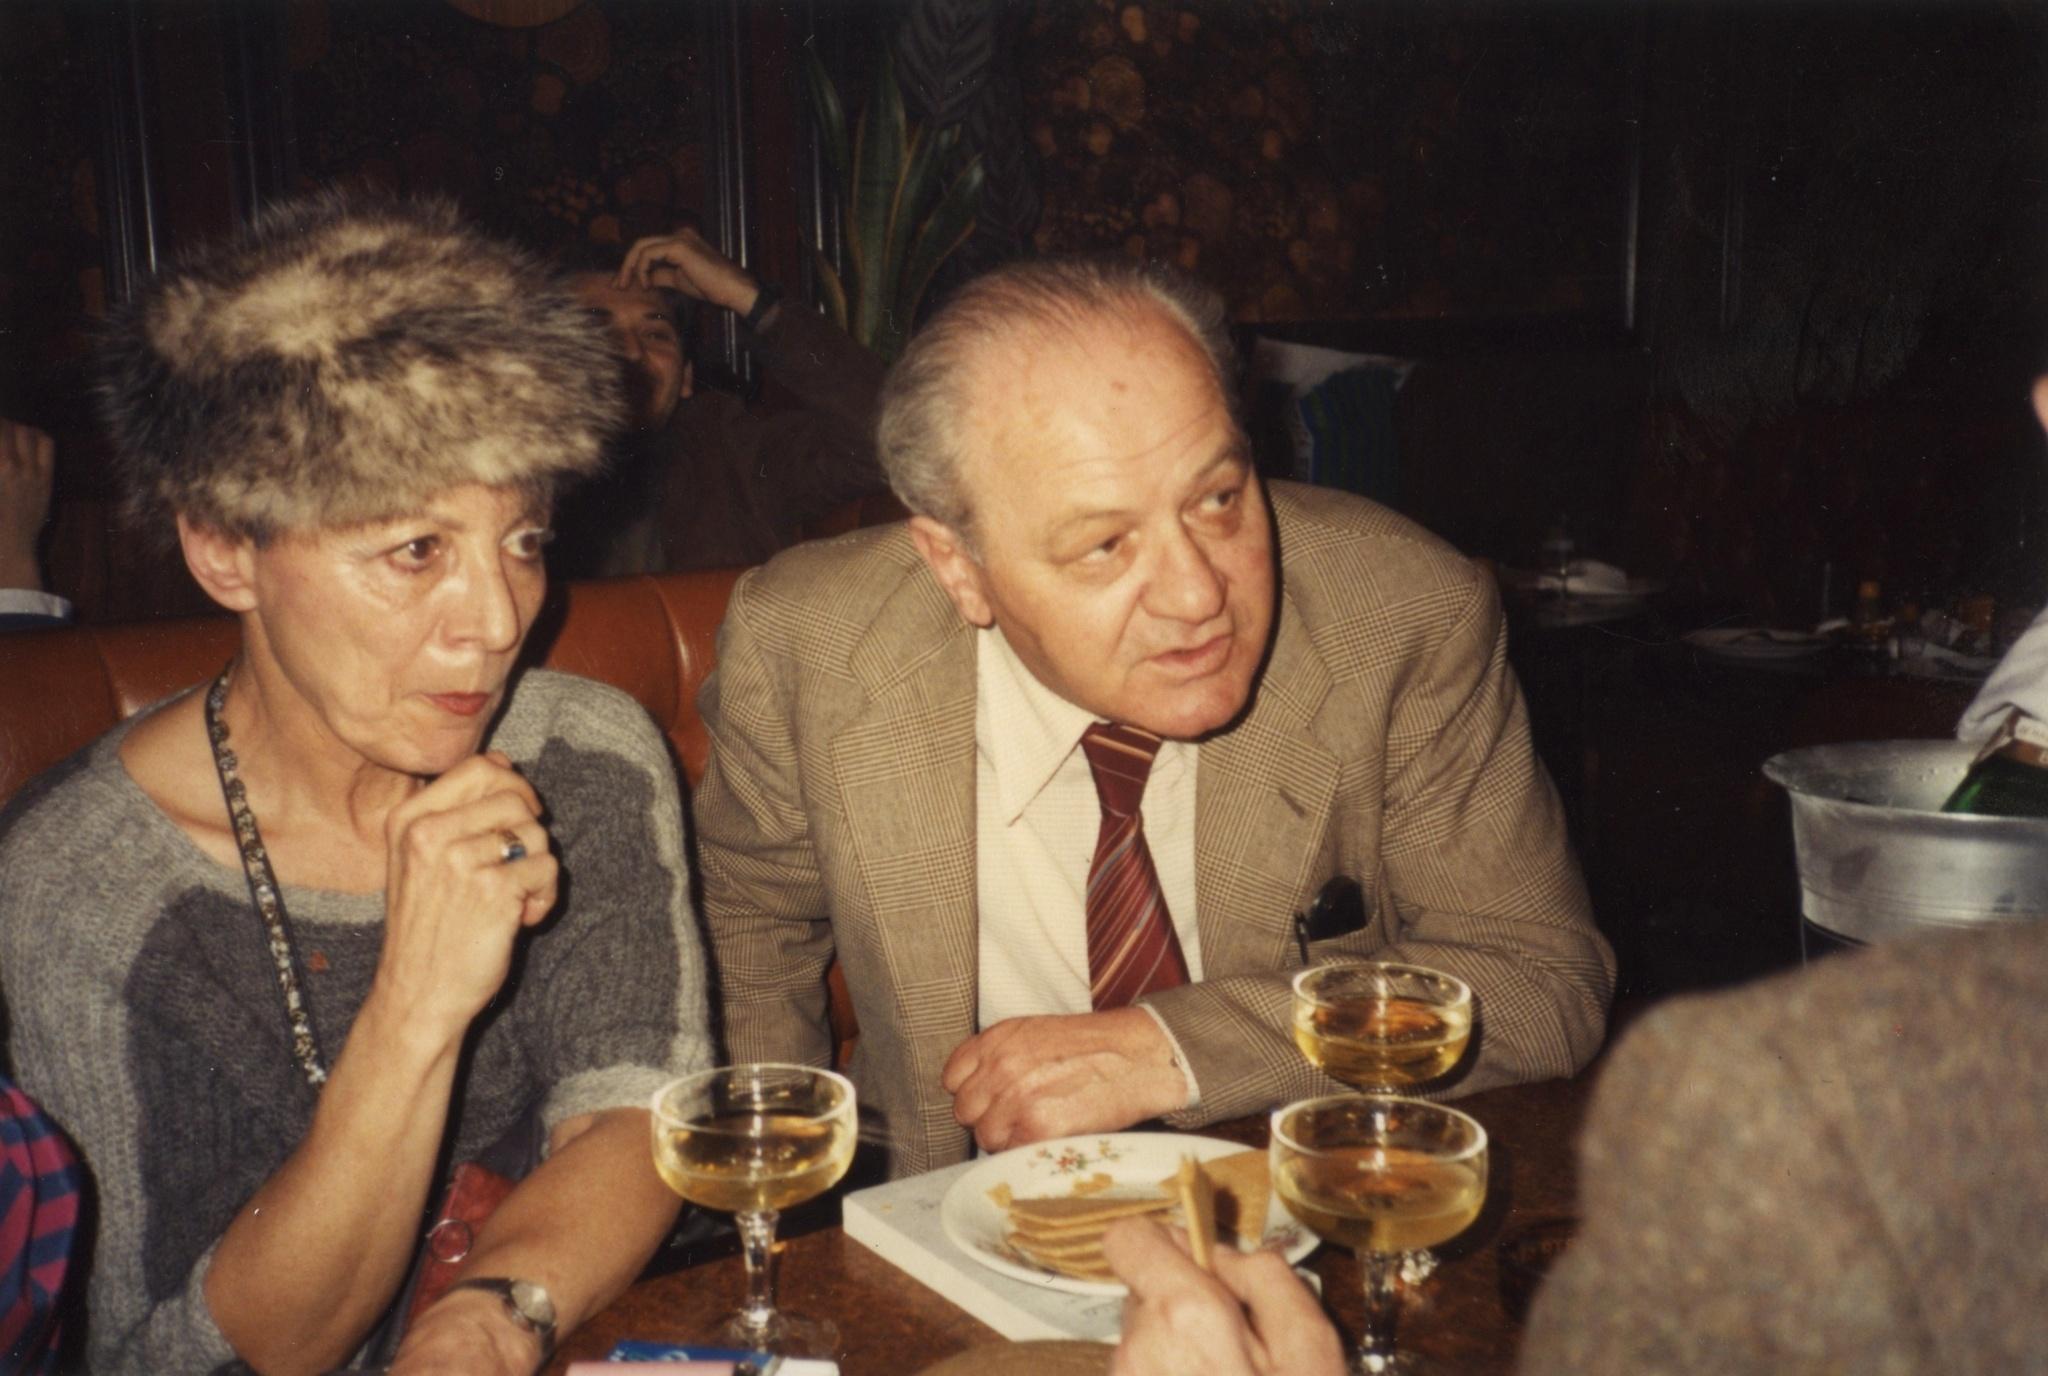 <div class='inner-box'><div class='close-desc'></div><span class='opis'>Olga Scherer i Gustaw Herling-Grudziński w kawiarni. Paryż (zdjęcie z lat 1980-90)</span><div class='clearfix'></div><span>Sygn. FIL00697</span><div class='clearfix'></div><span>&copy; Instytut Literacki</span></div>